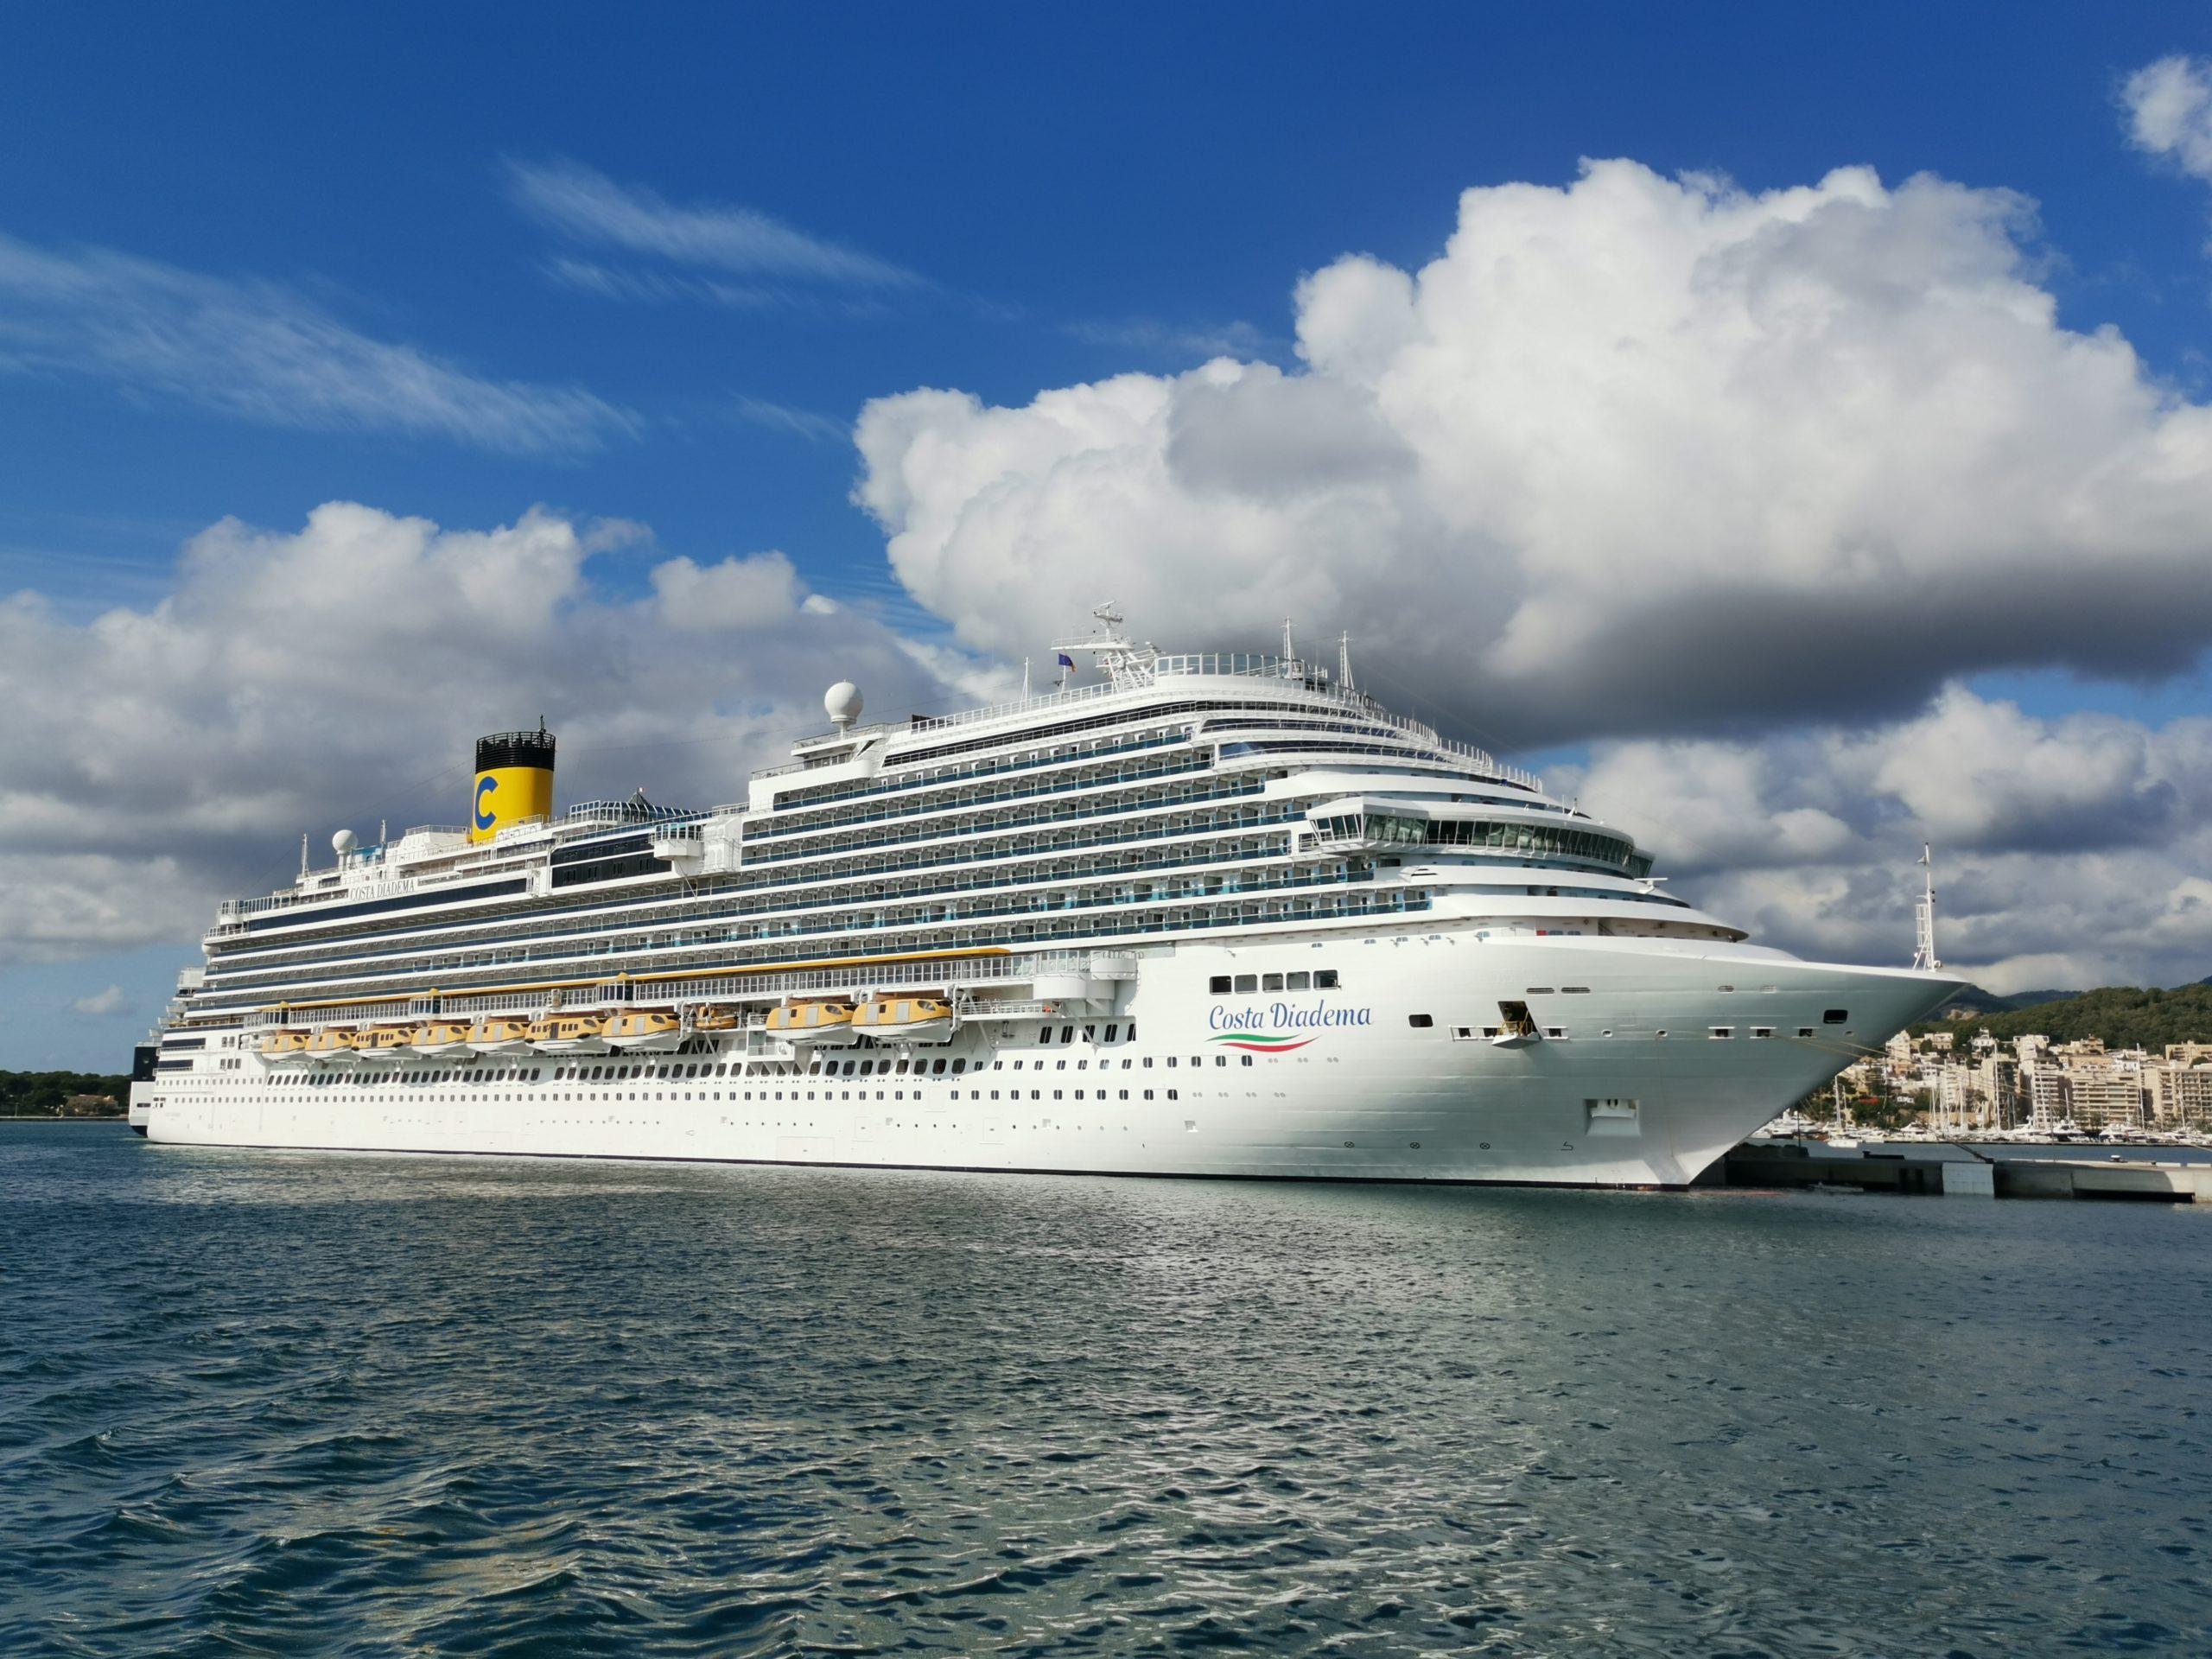 Costa's cruises return to Genoa